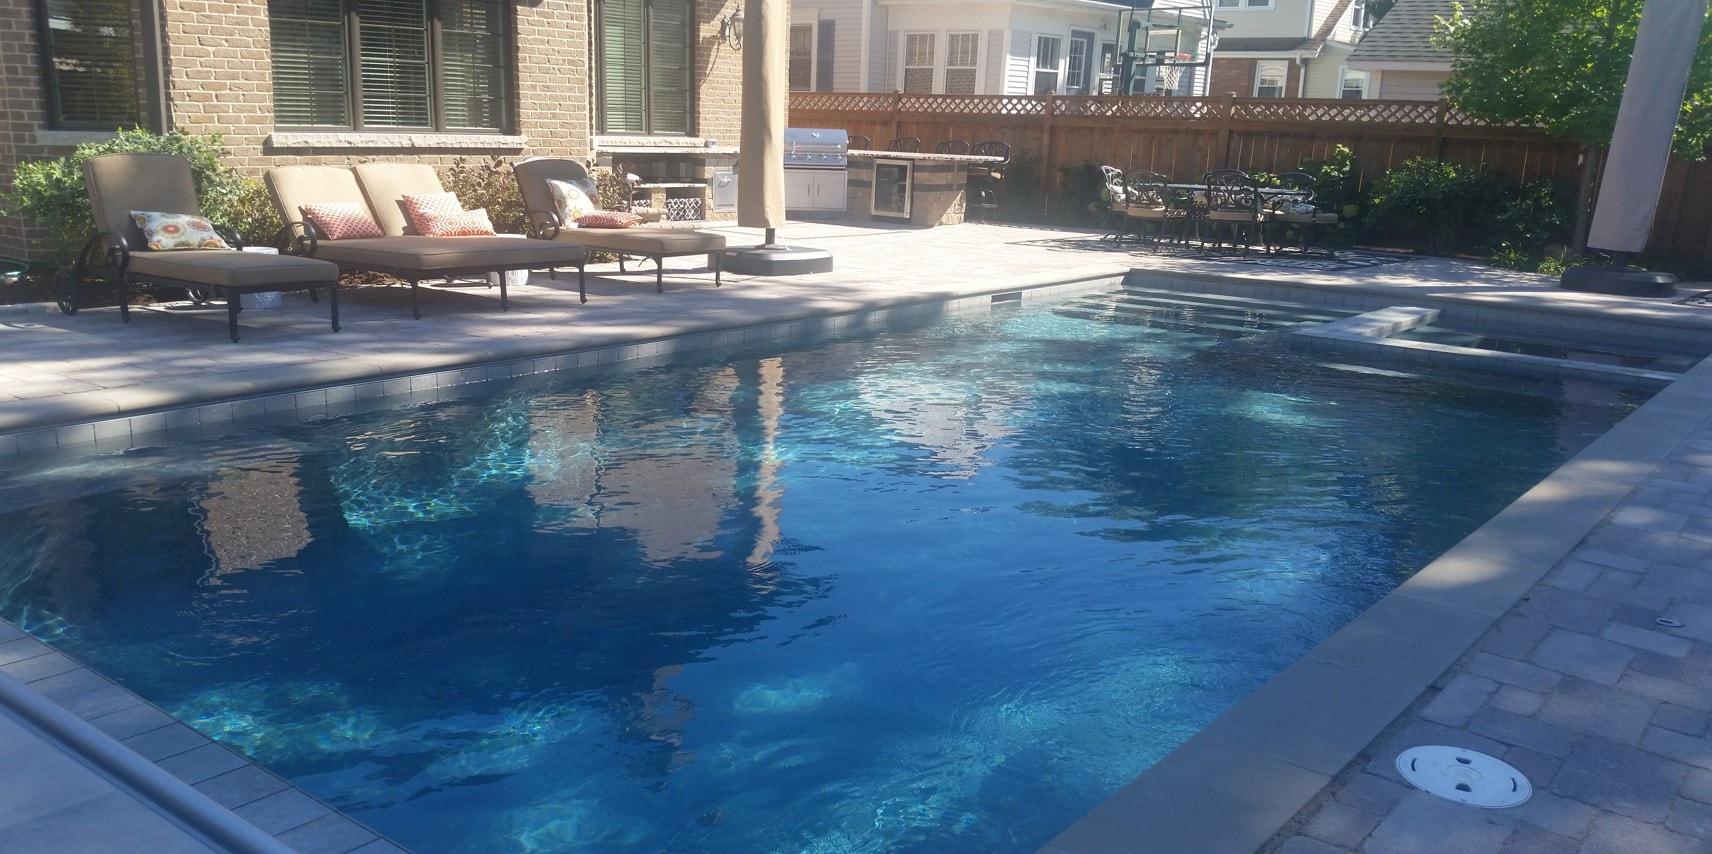 Gunite Swimming Pools Concrete Pool Builders Chicago Danna Pools